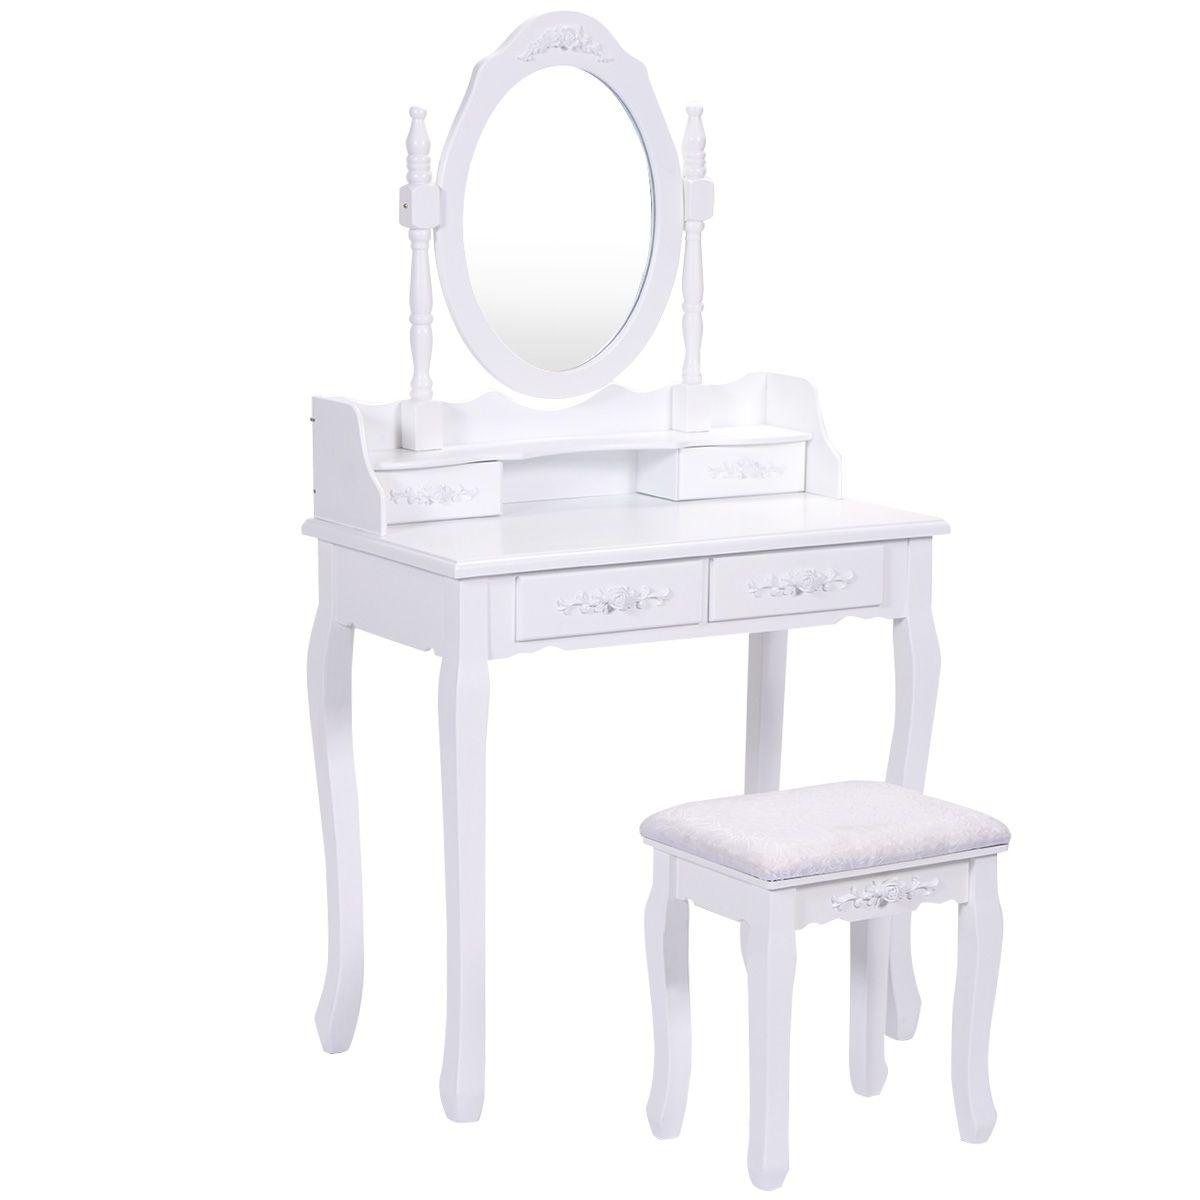 Levně Toaletní stolek Marie Thérése